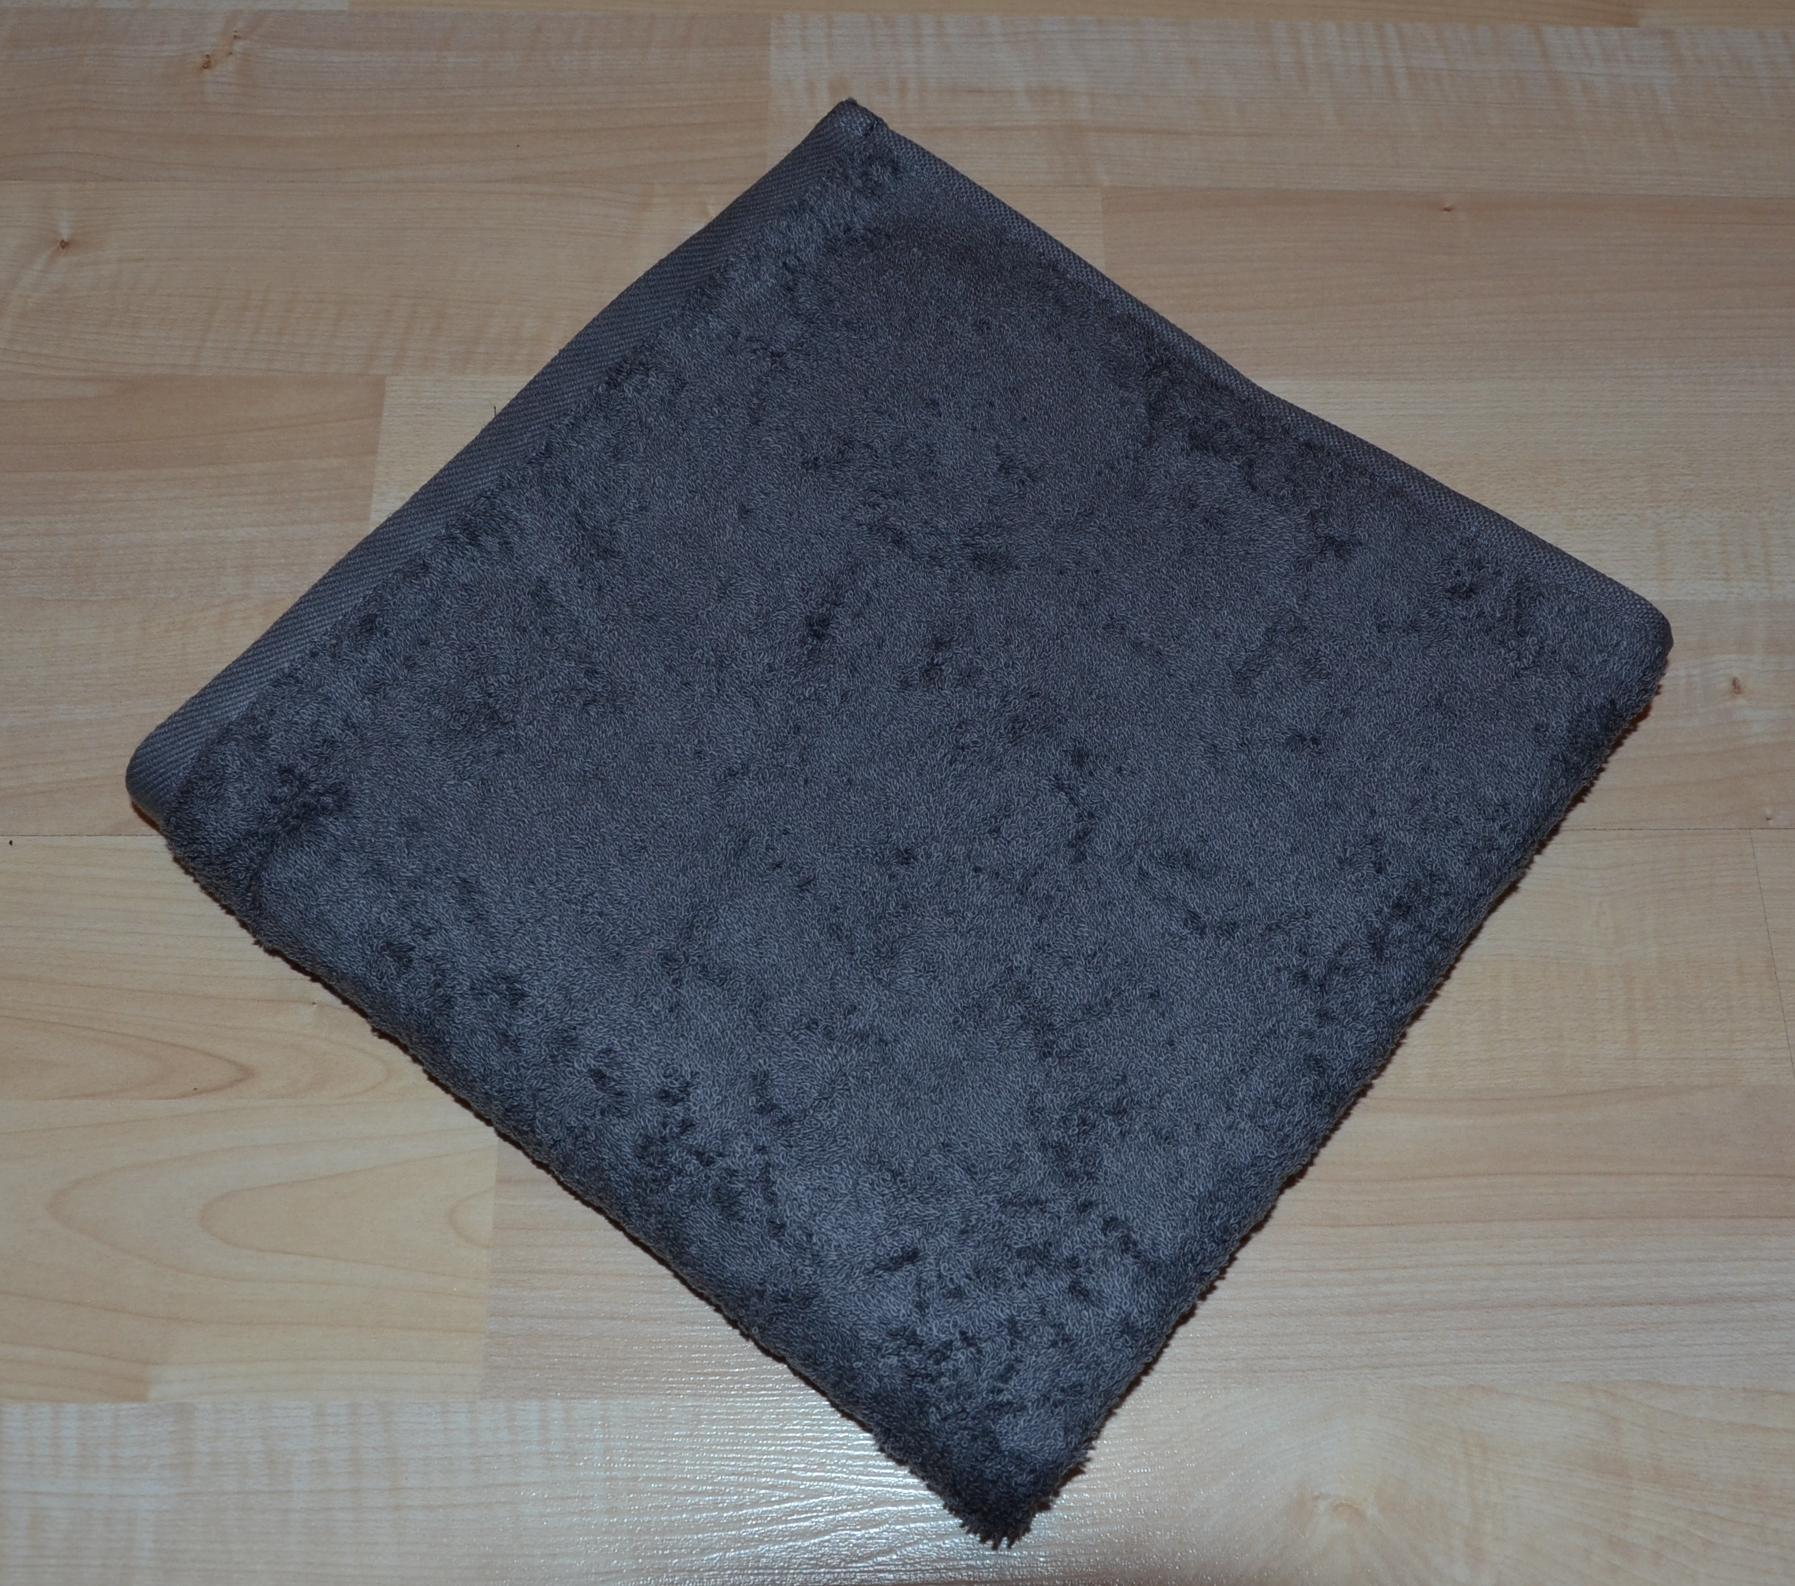 Froté osuška 70x140cm bez proužku 450g tmavě šedá